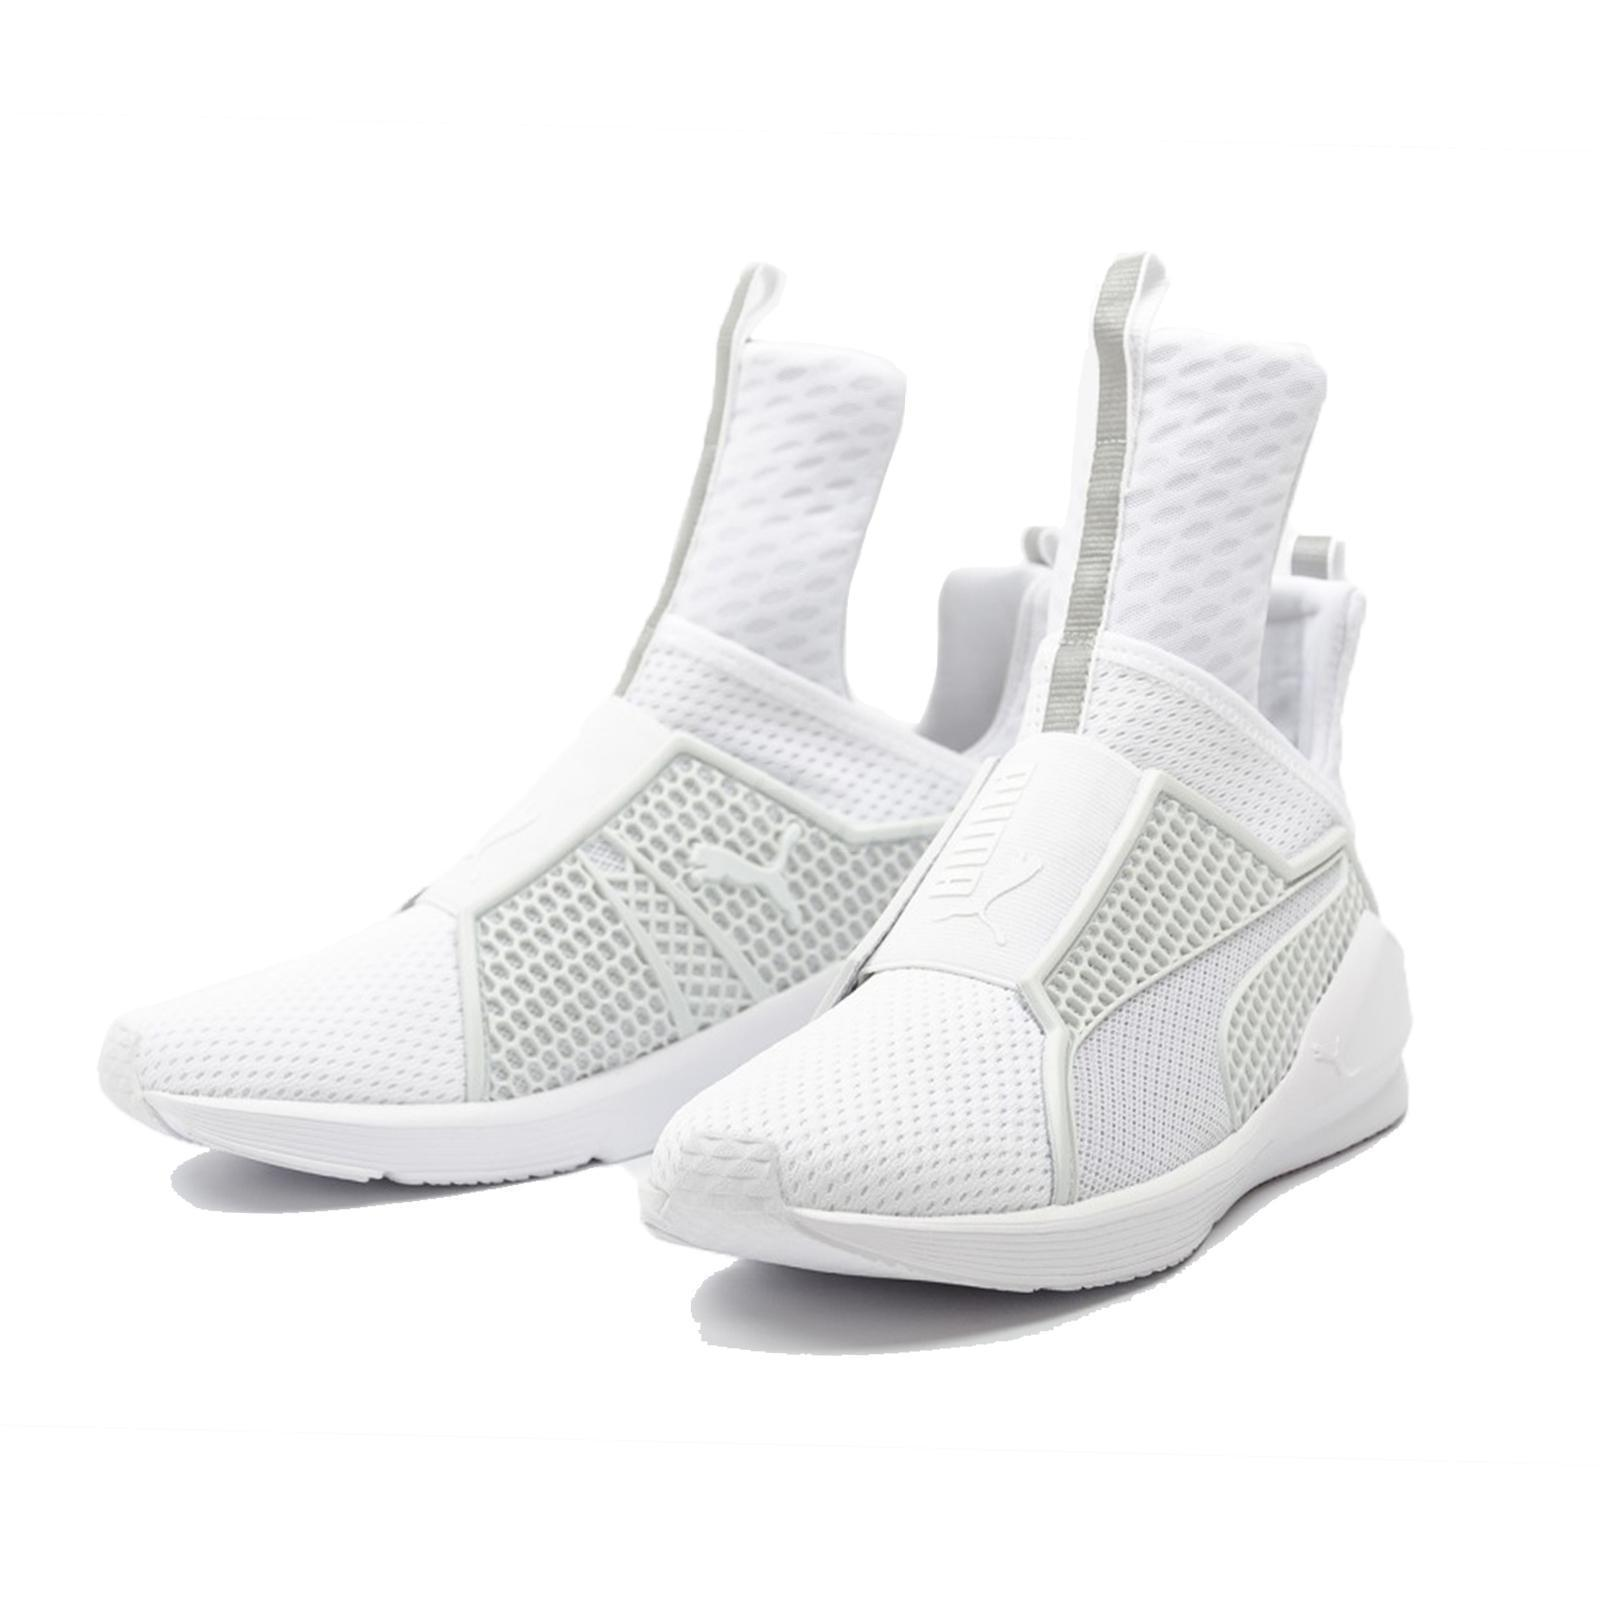 57. 57. Previous. New Puma x Rihanna Fenty Trainer RIRI White Women s Cross  Training Sneakers ... 8690e5ee0